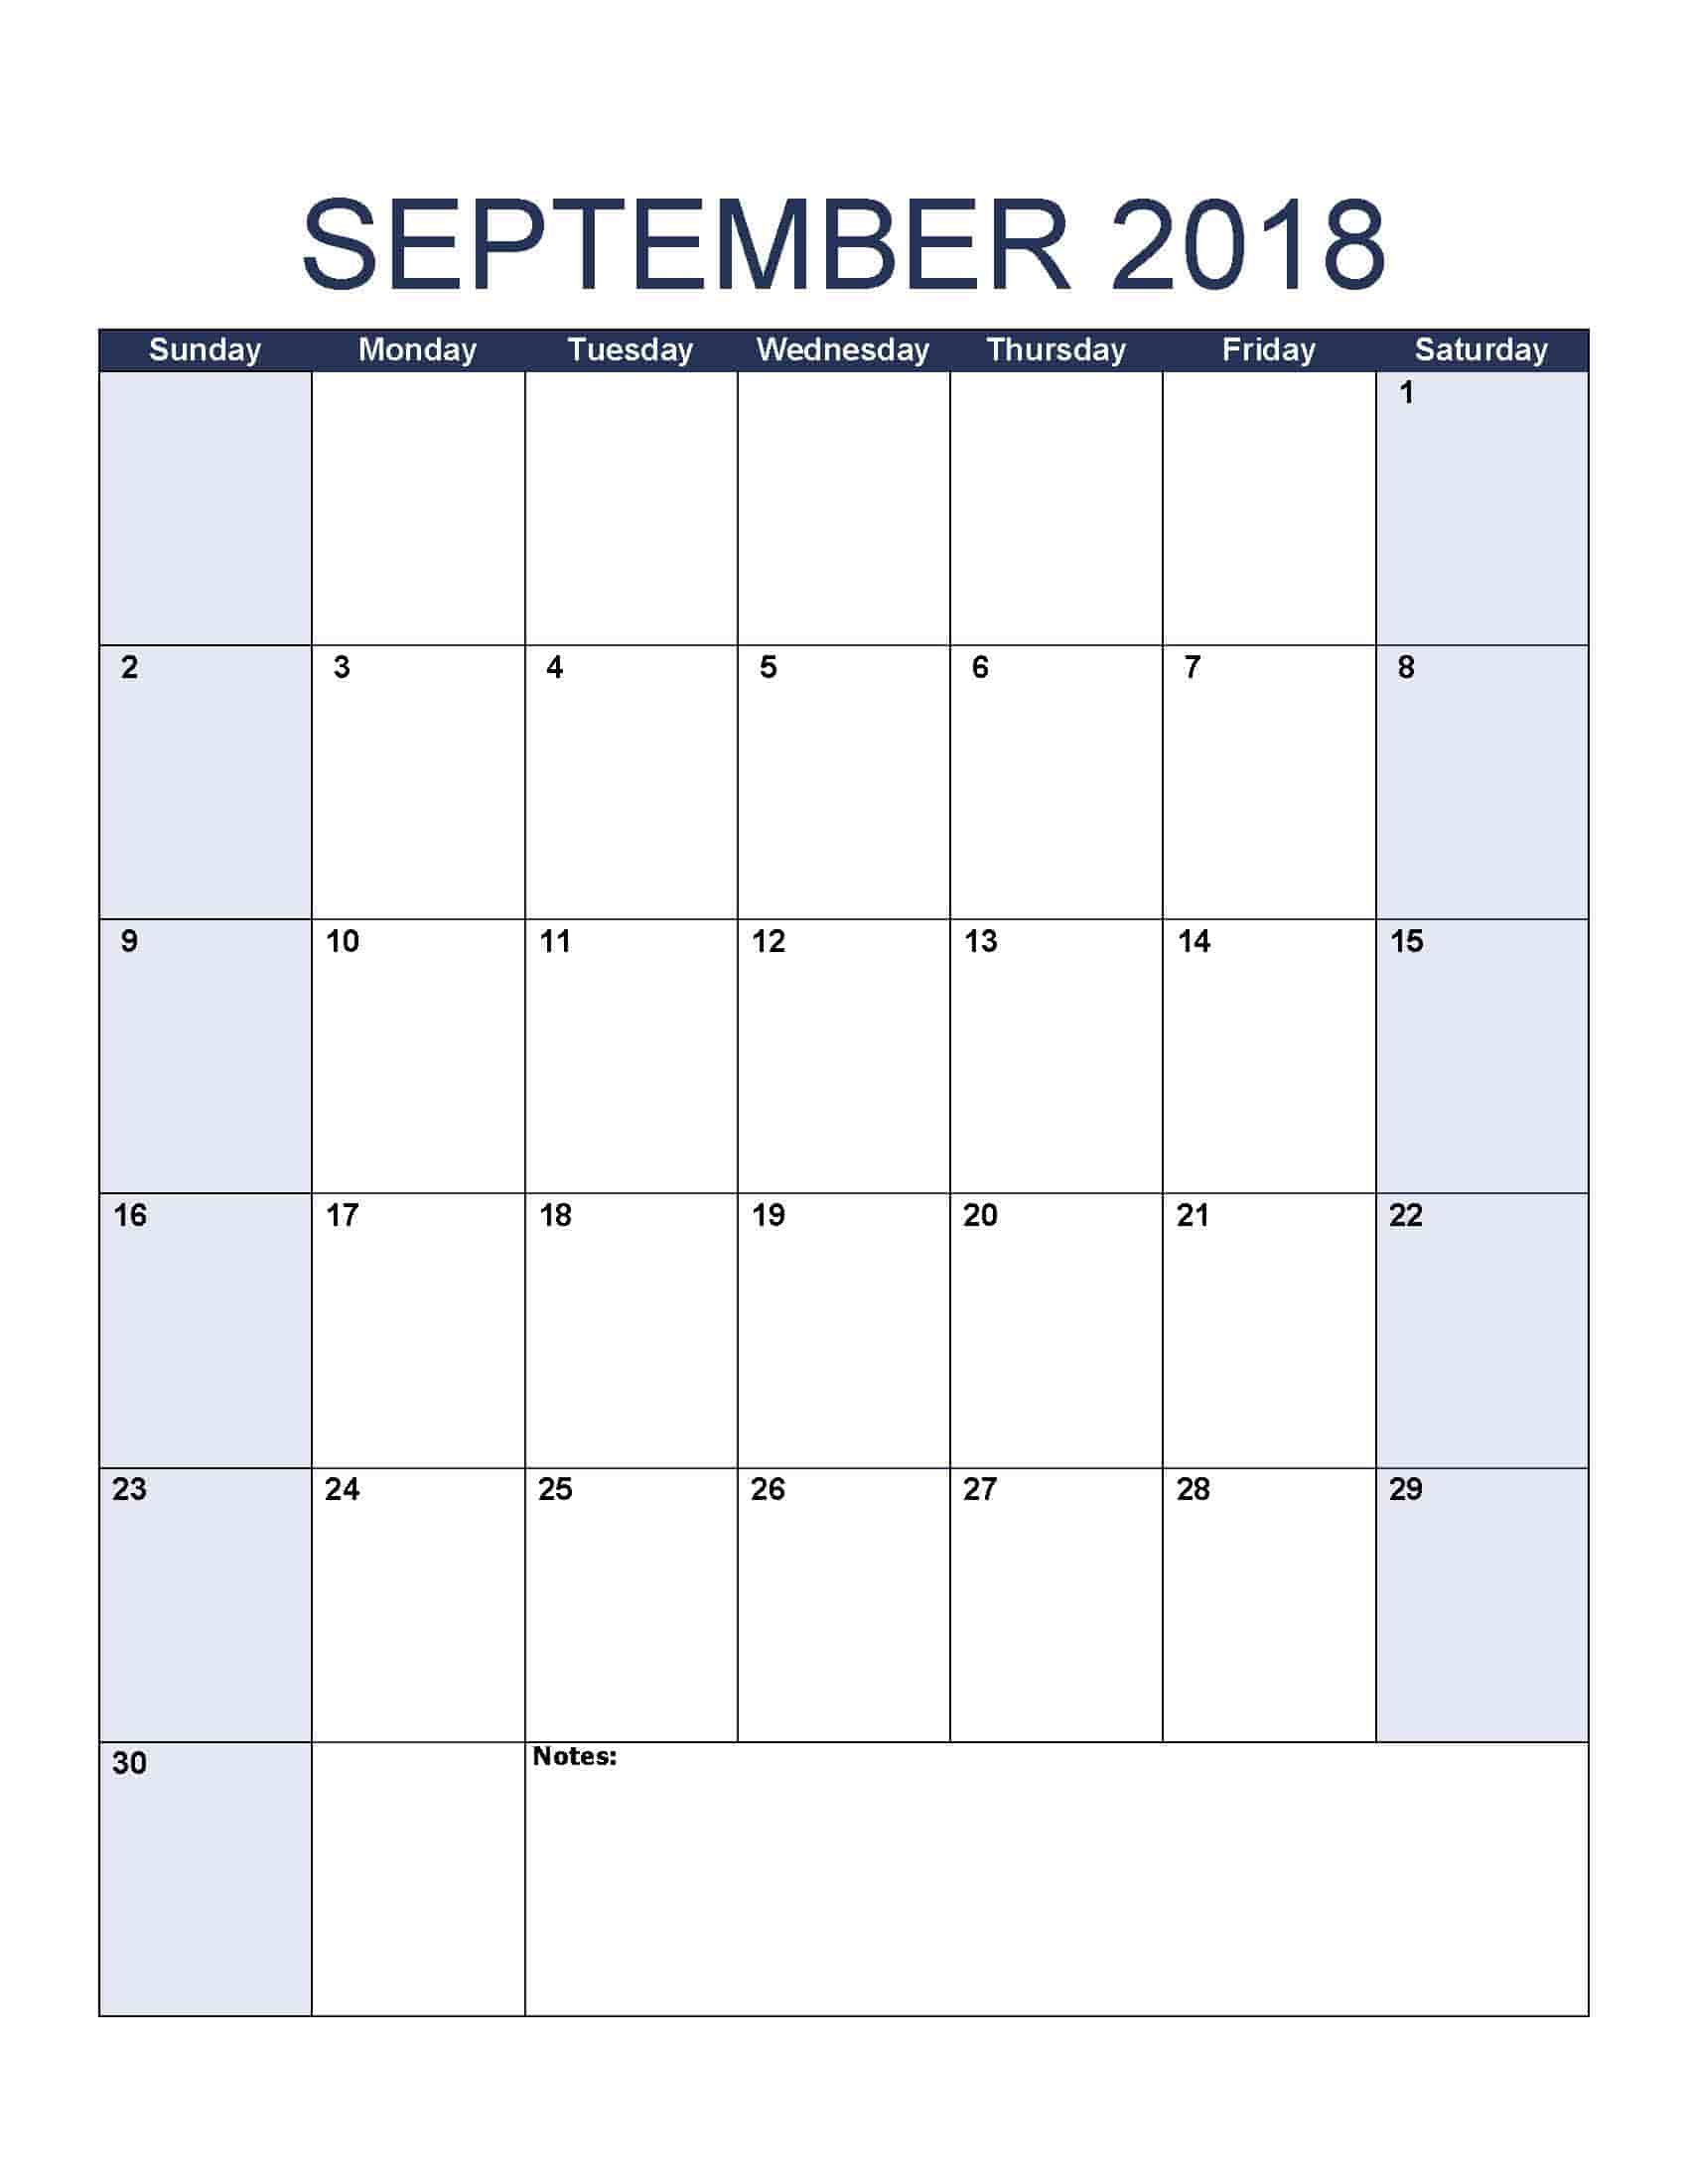 September 2018 Calendar - Free, Printable Calendar Templates in Free Printable Blank Calendar Templates